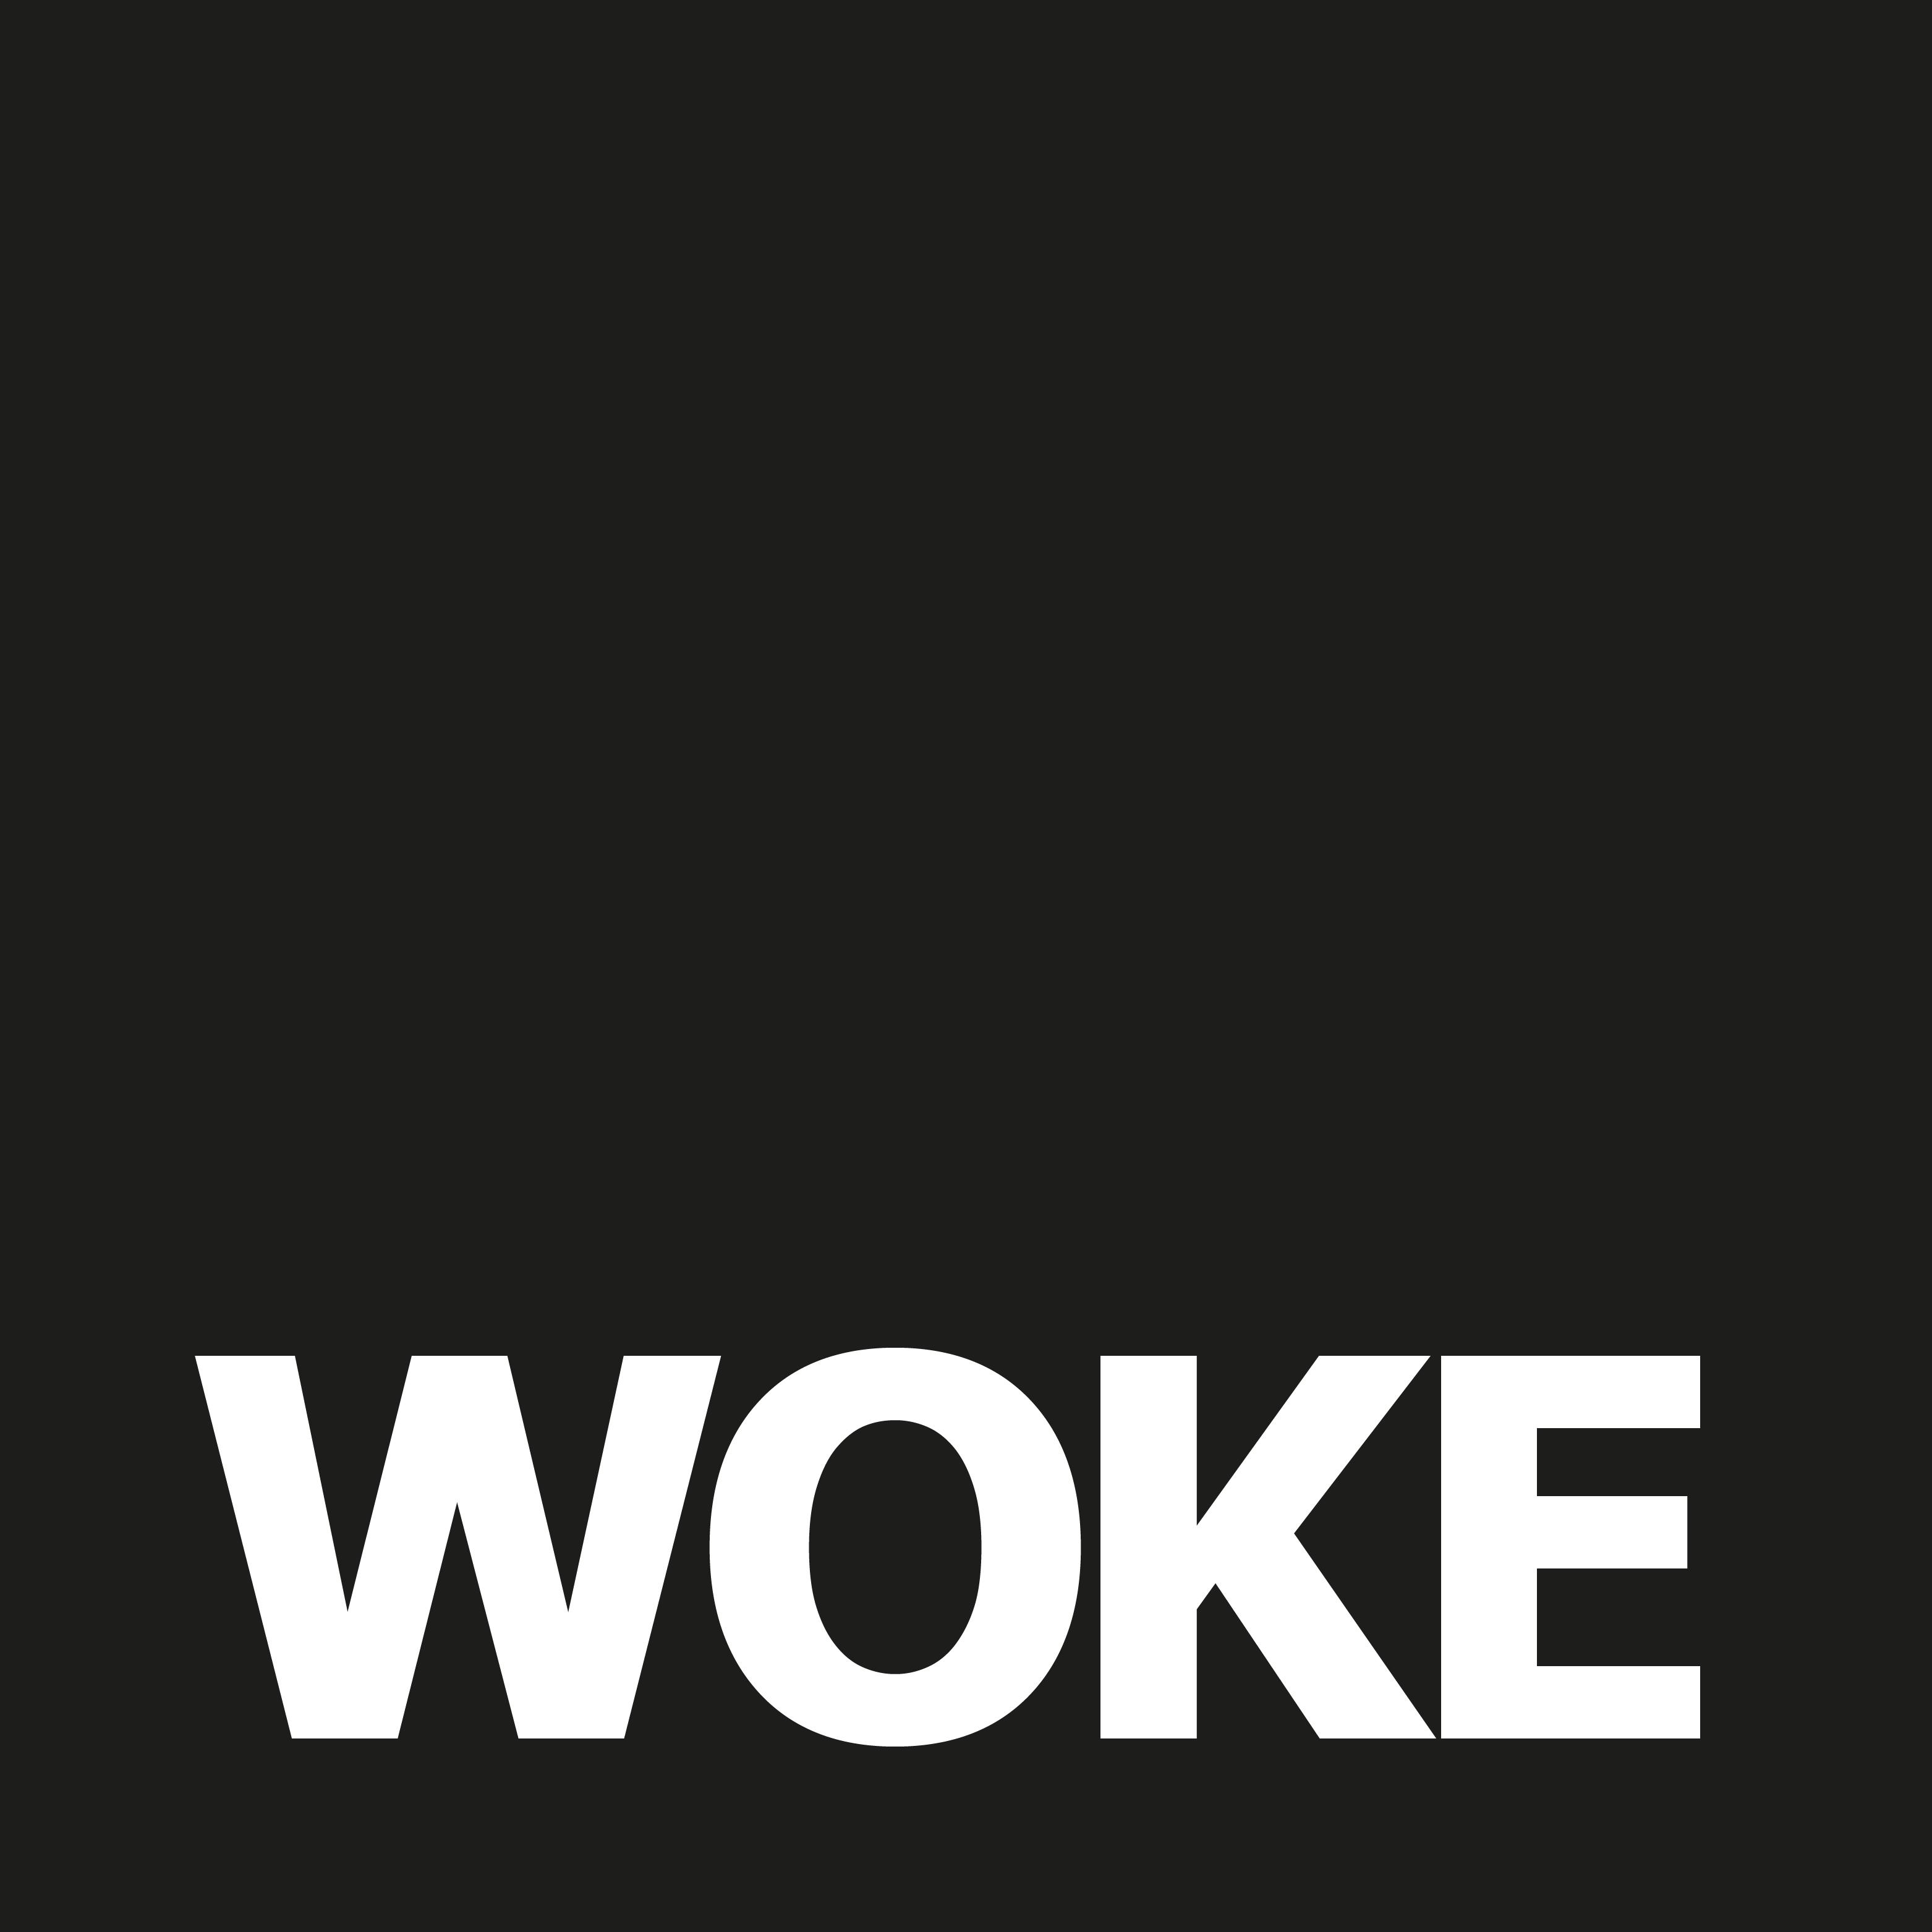 logo woke